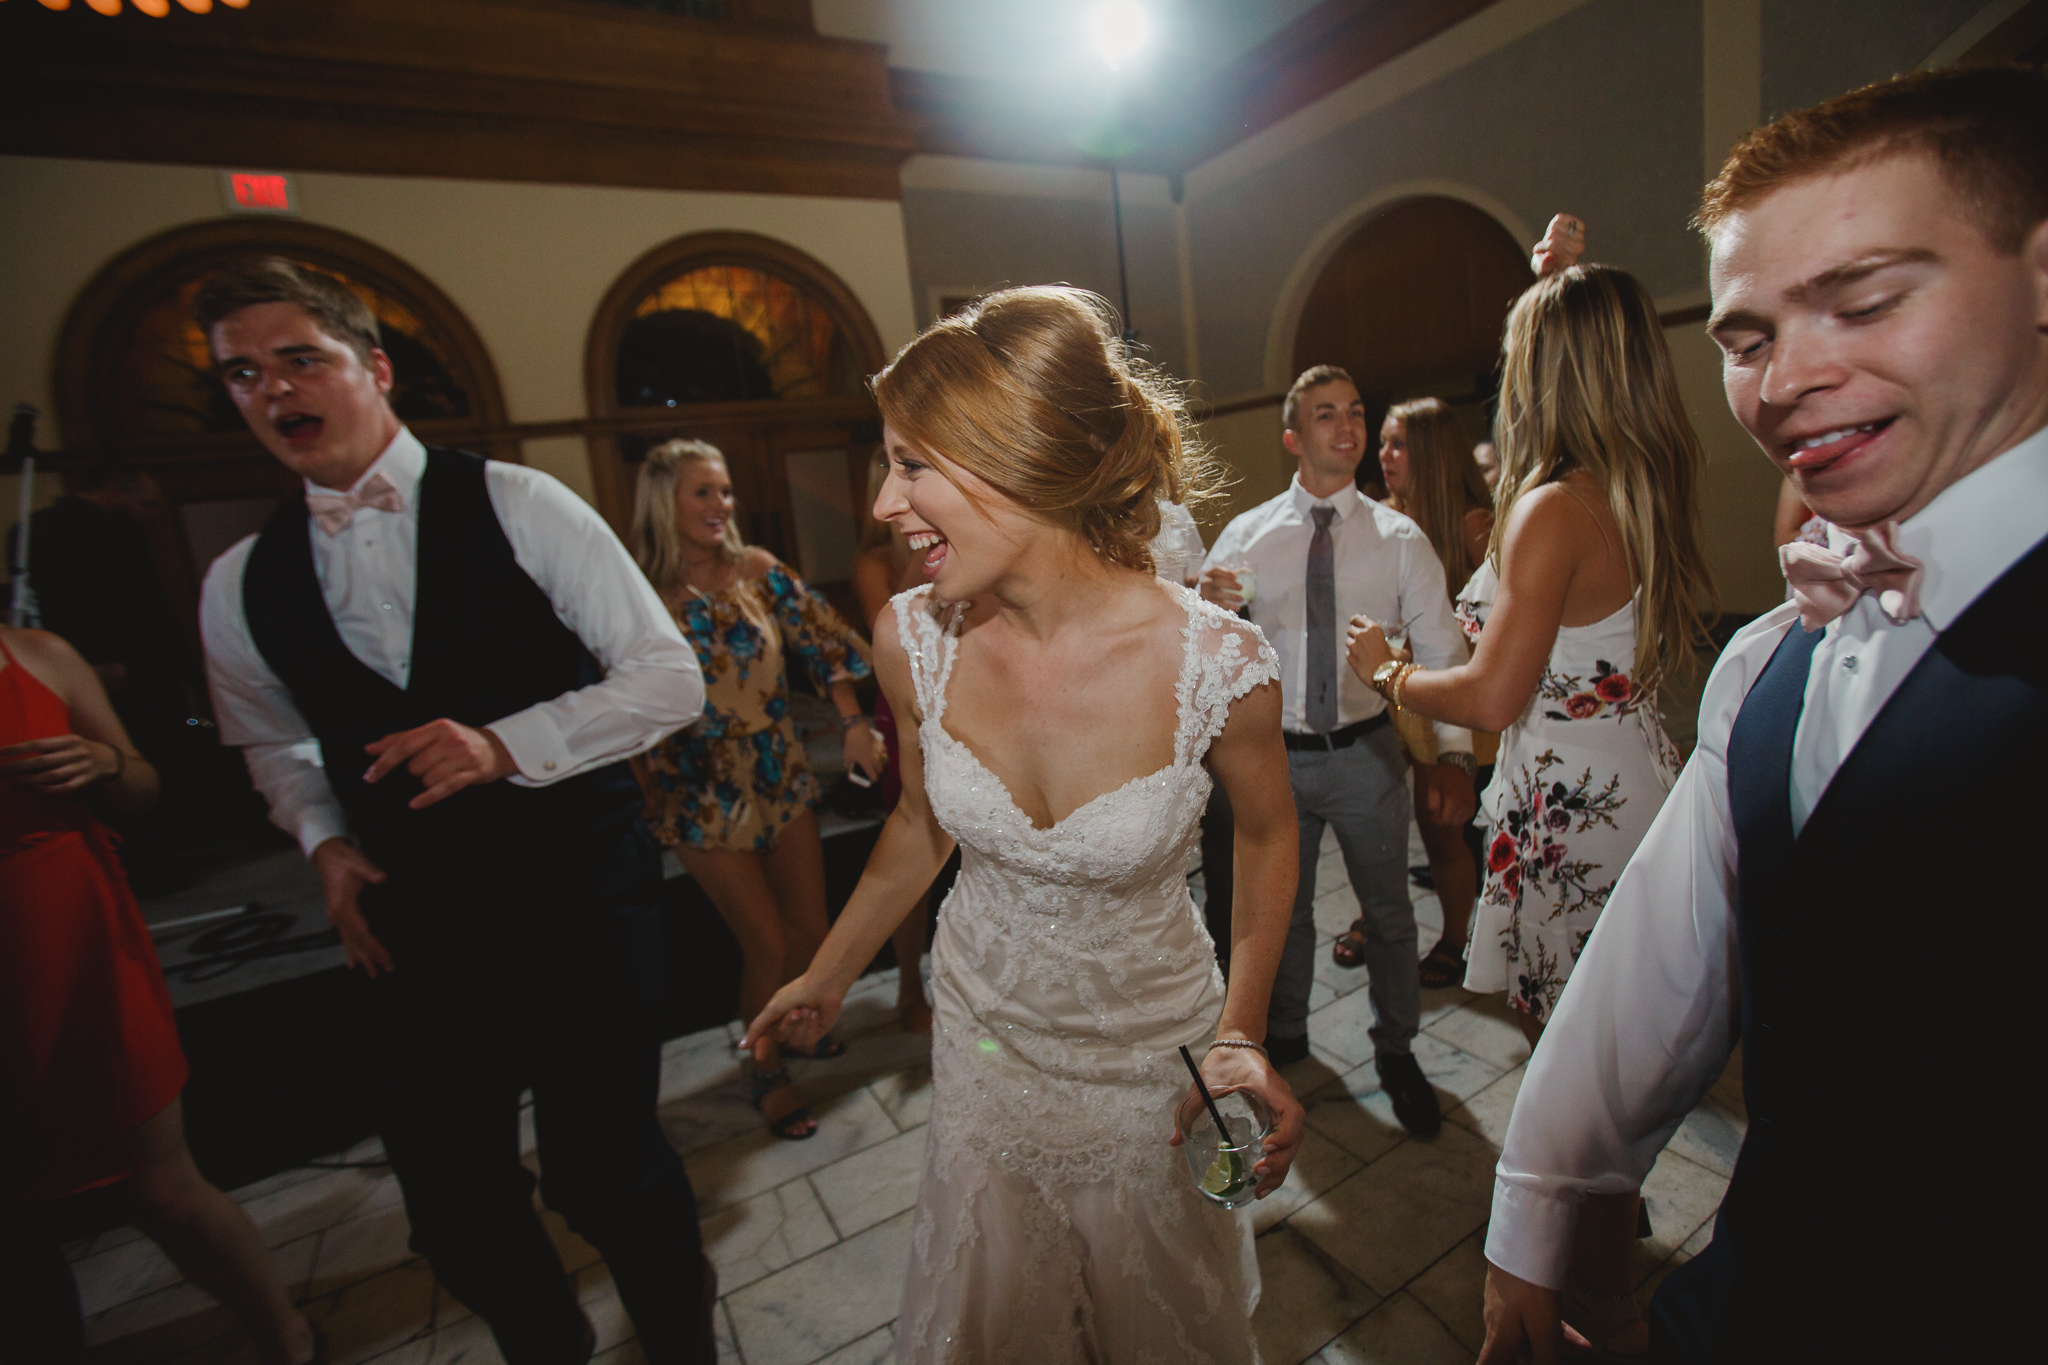 Michael and Kelly - the ashton depot - wedding DFW - wedding photographer- elizalde photography (141 of 150).jpg